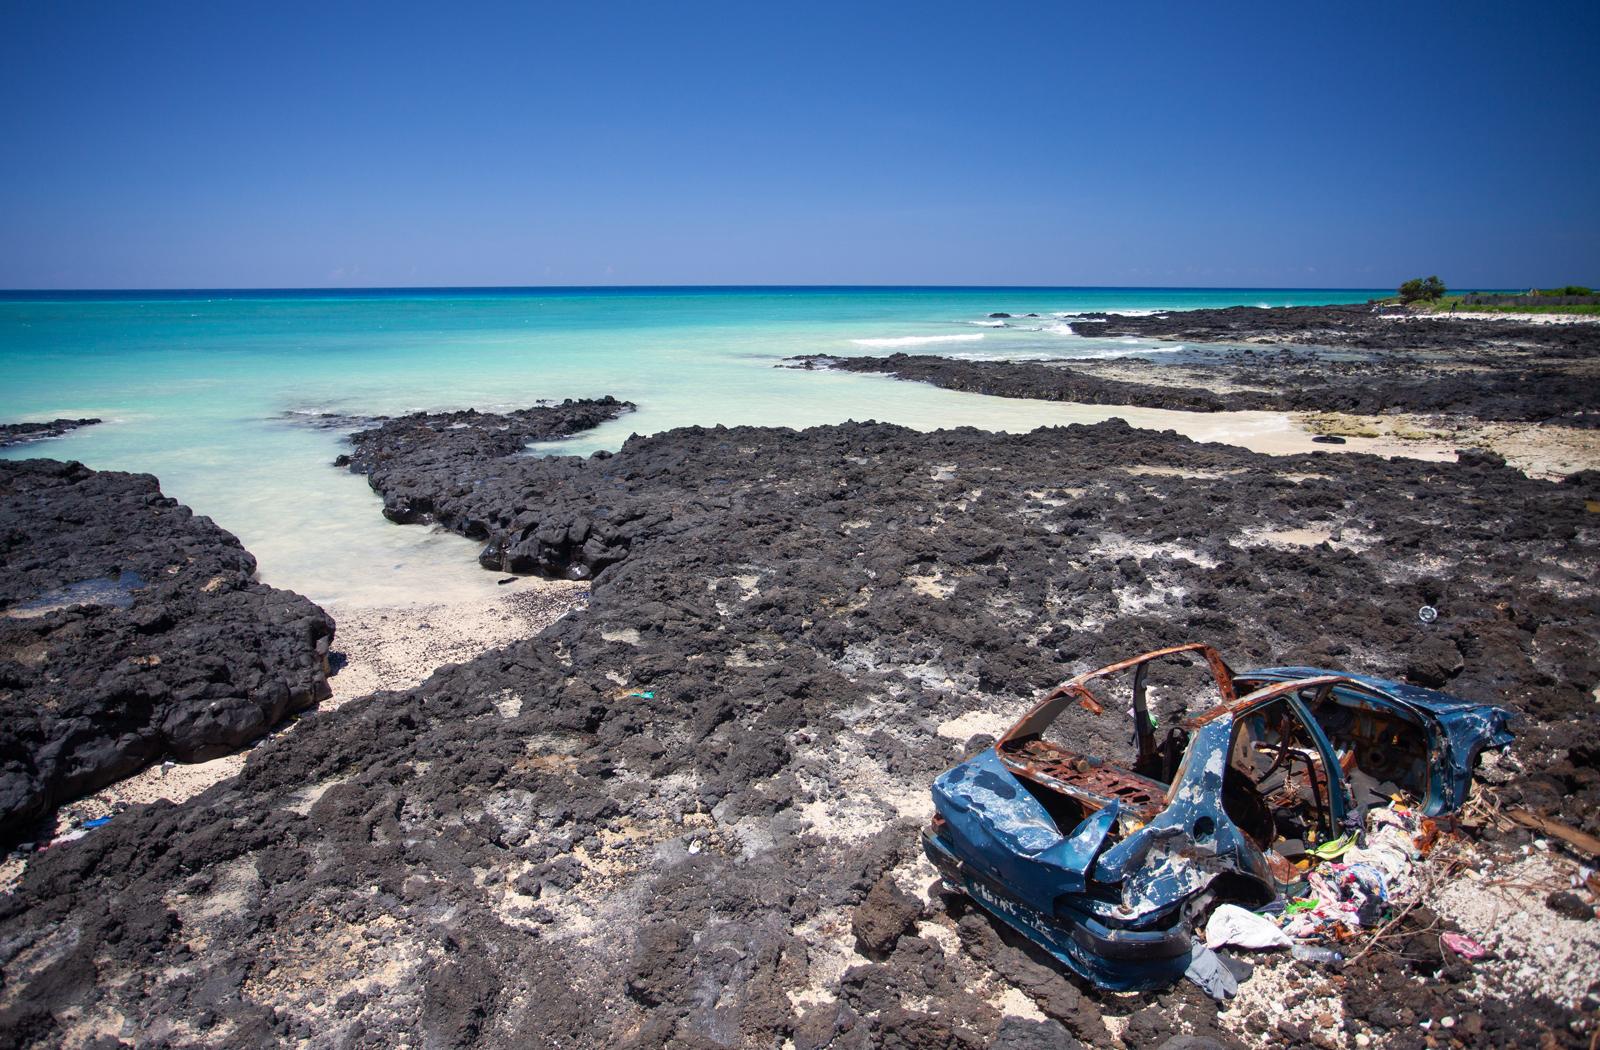 Abandoned car along the shoreline in Grande Comore